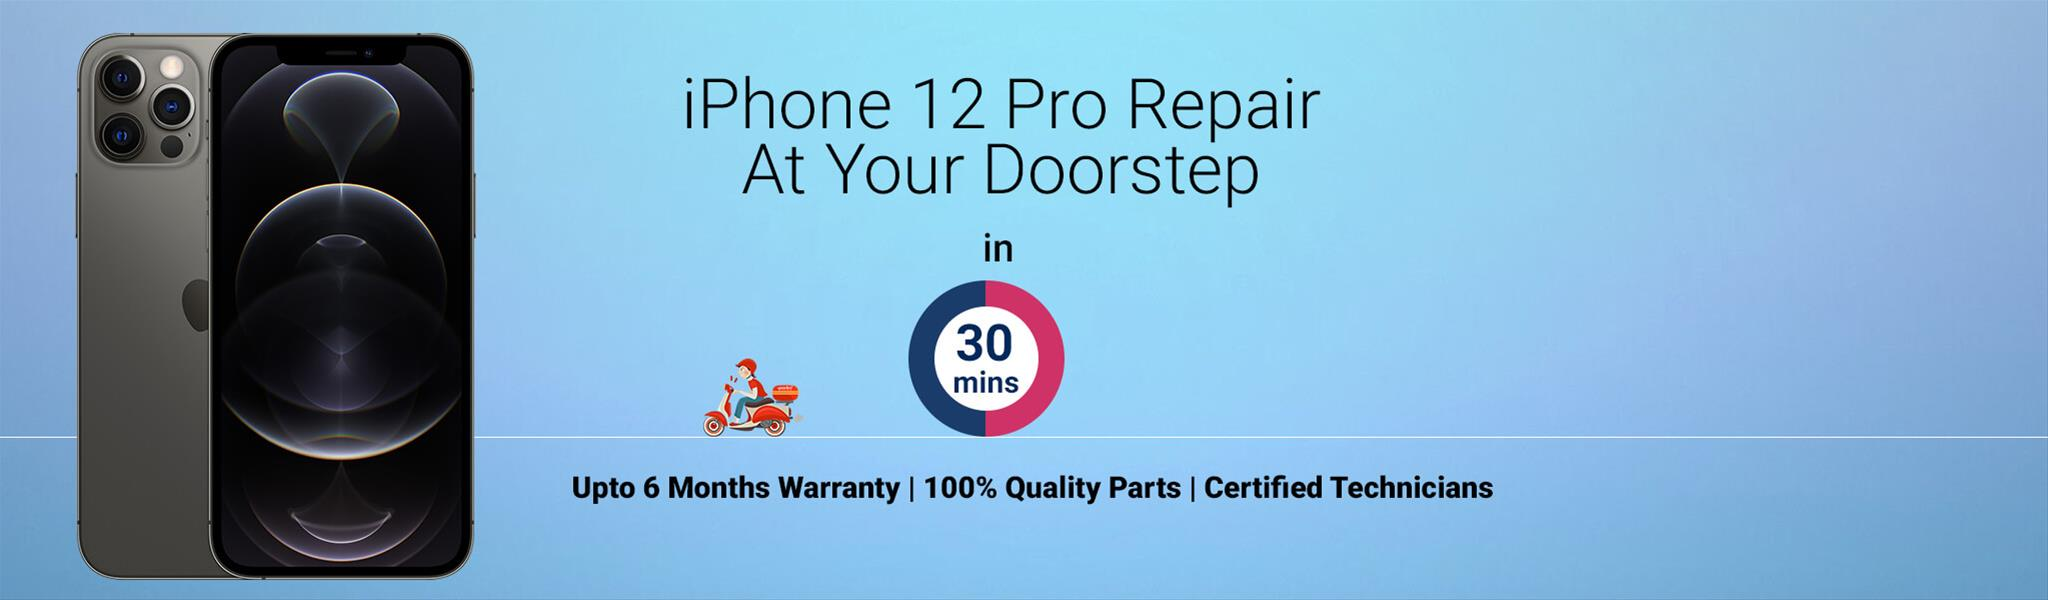 iphone-12-pro-repair.jpg